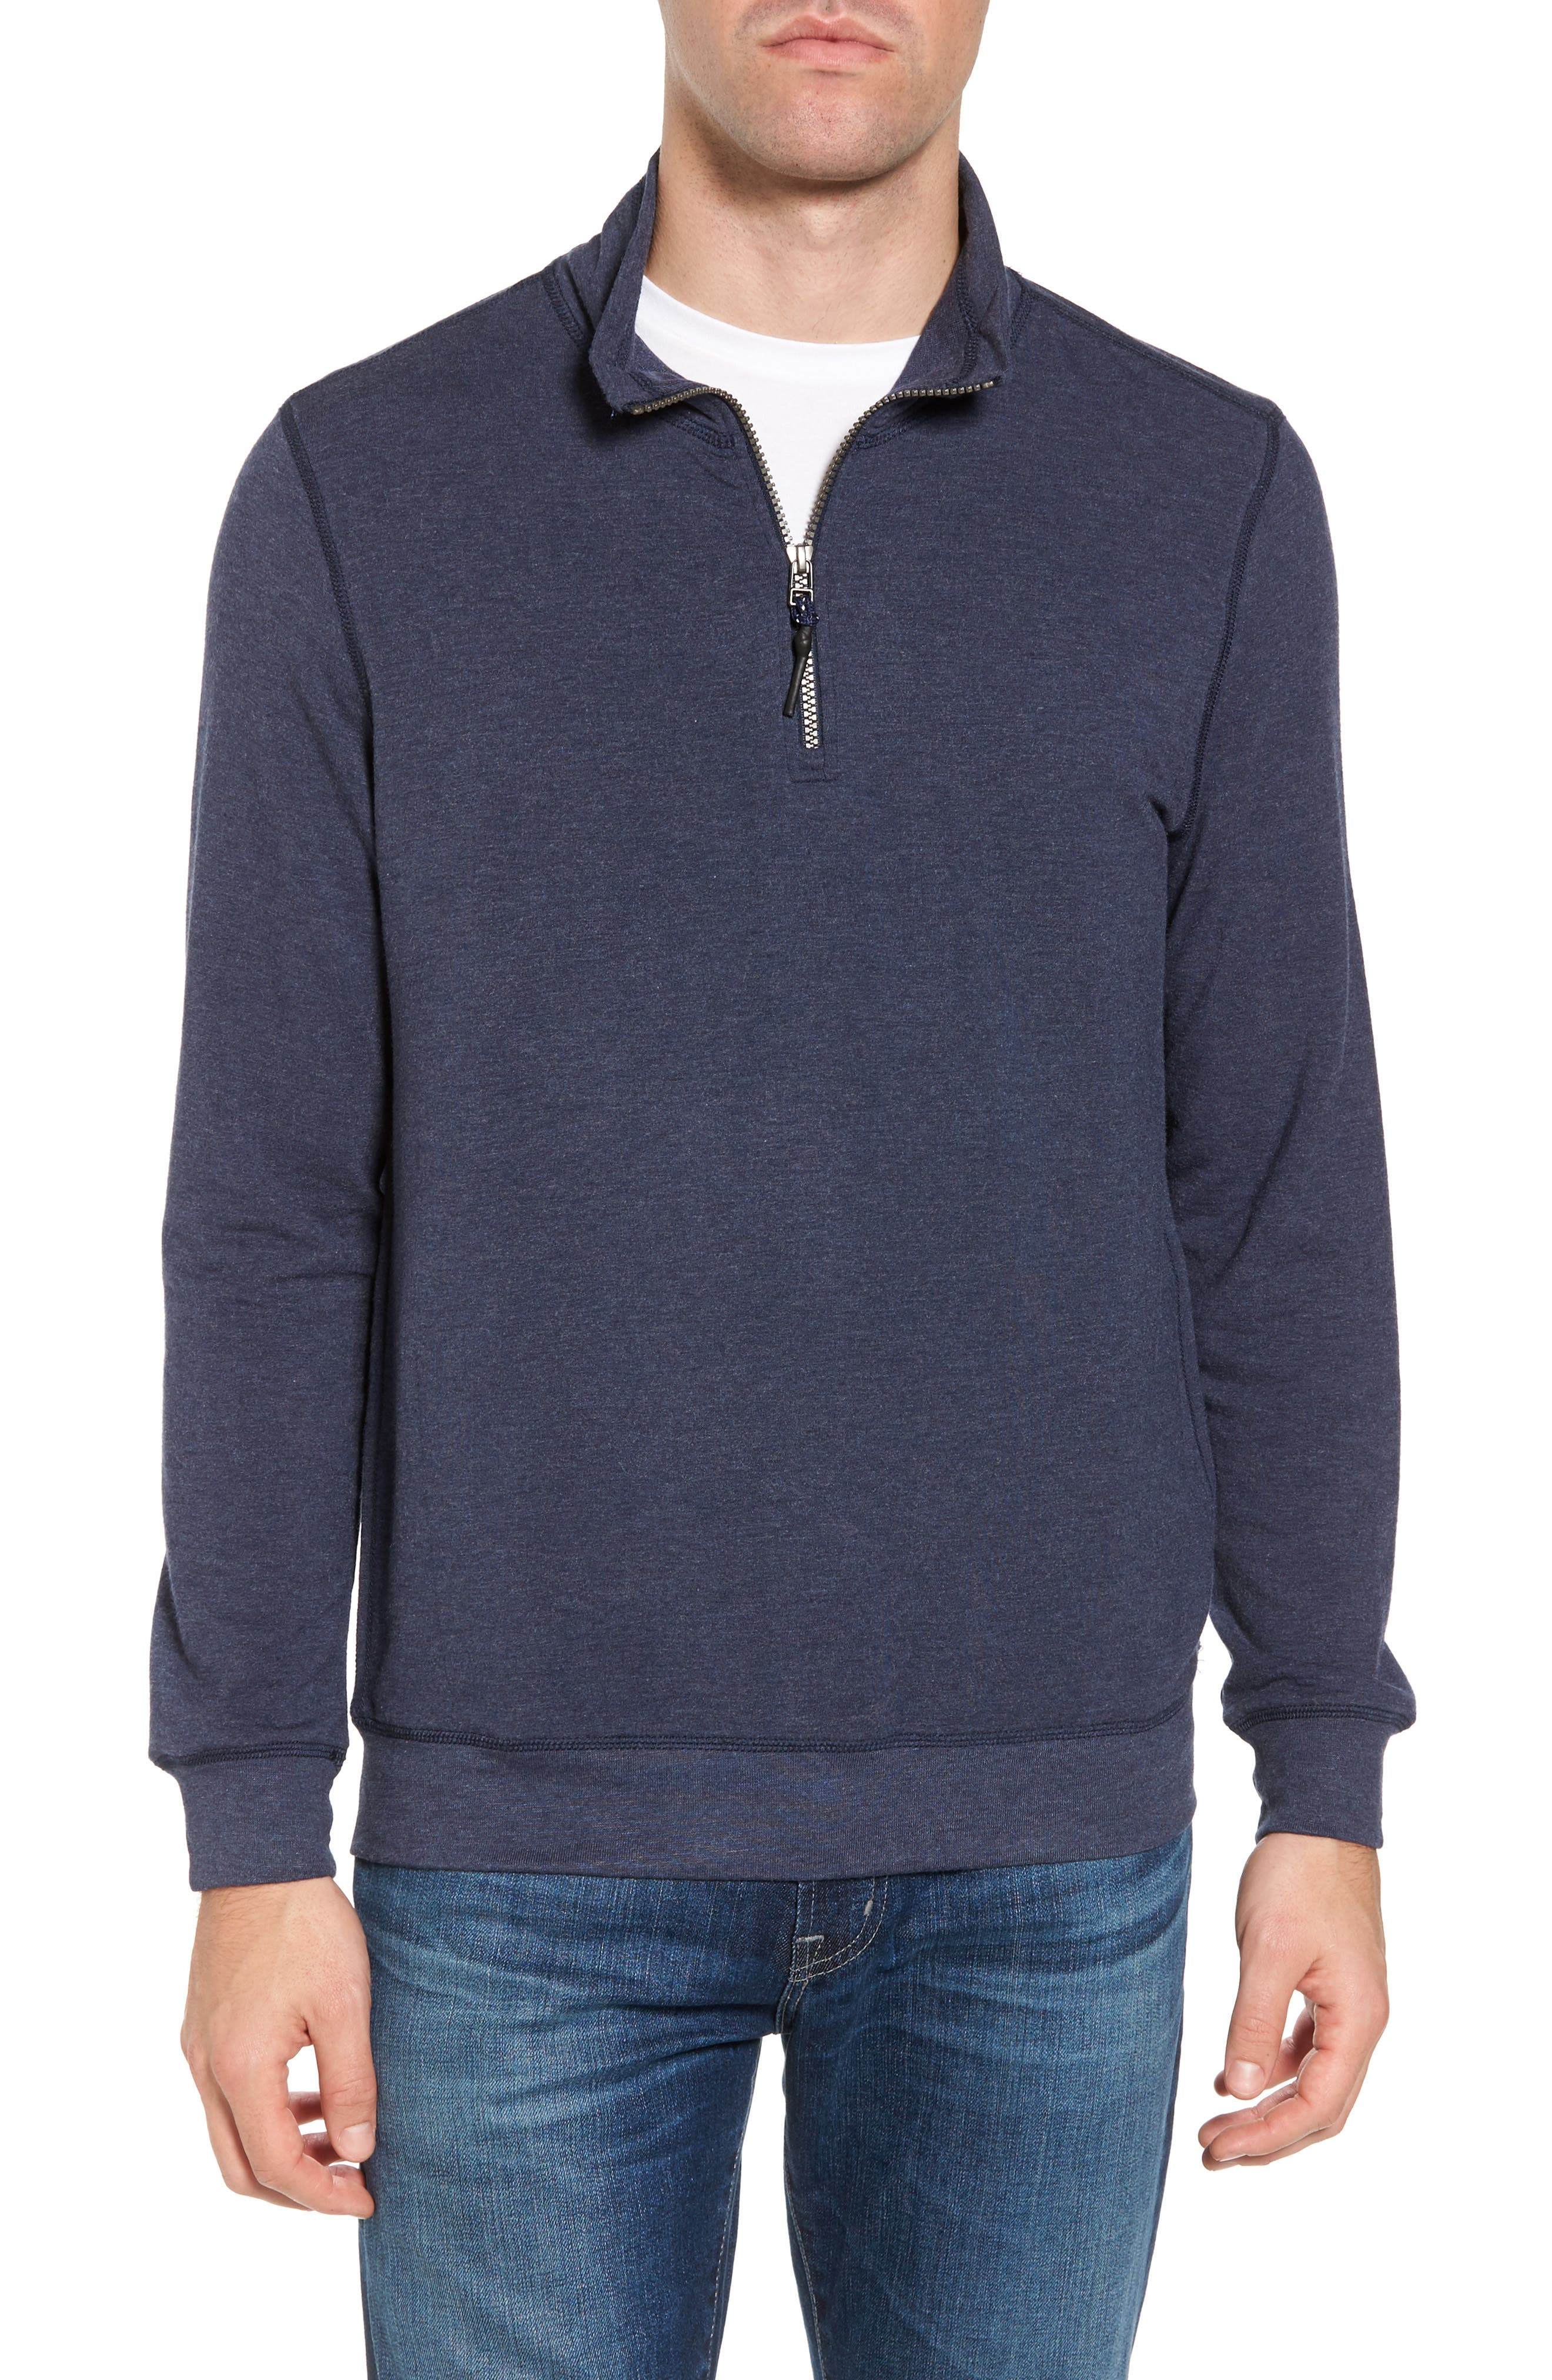 Main Image - Surfside Supply Brushback Quarter Zip Pullover